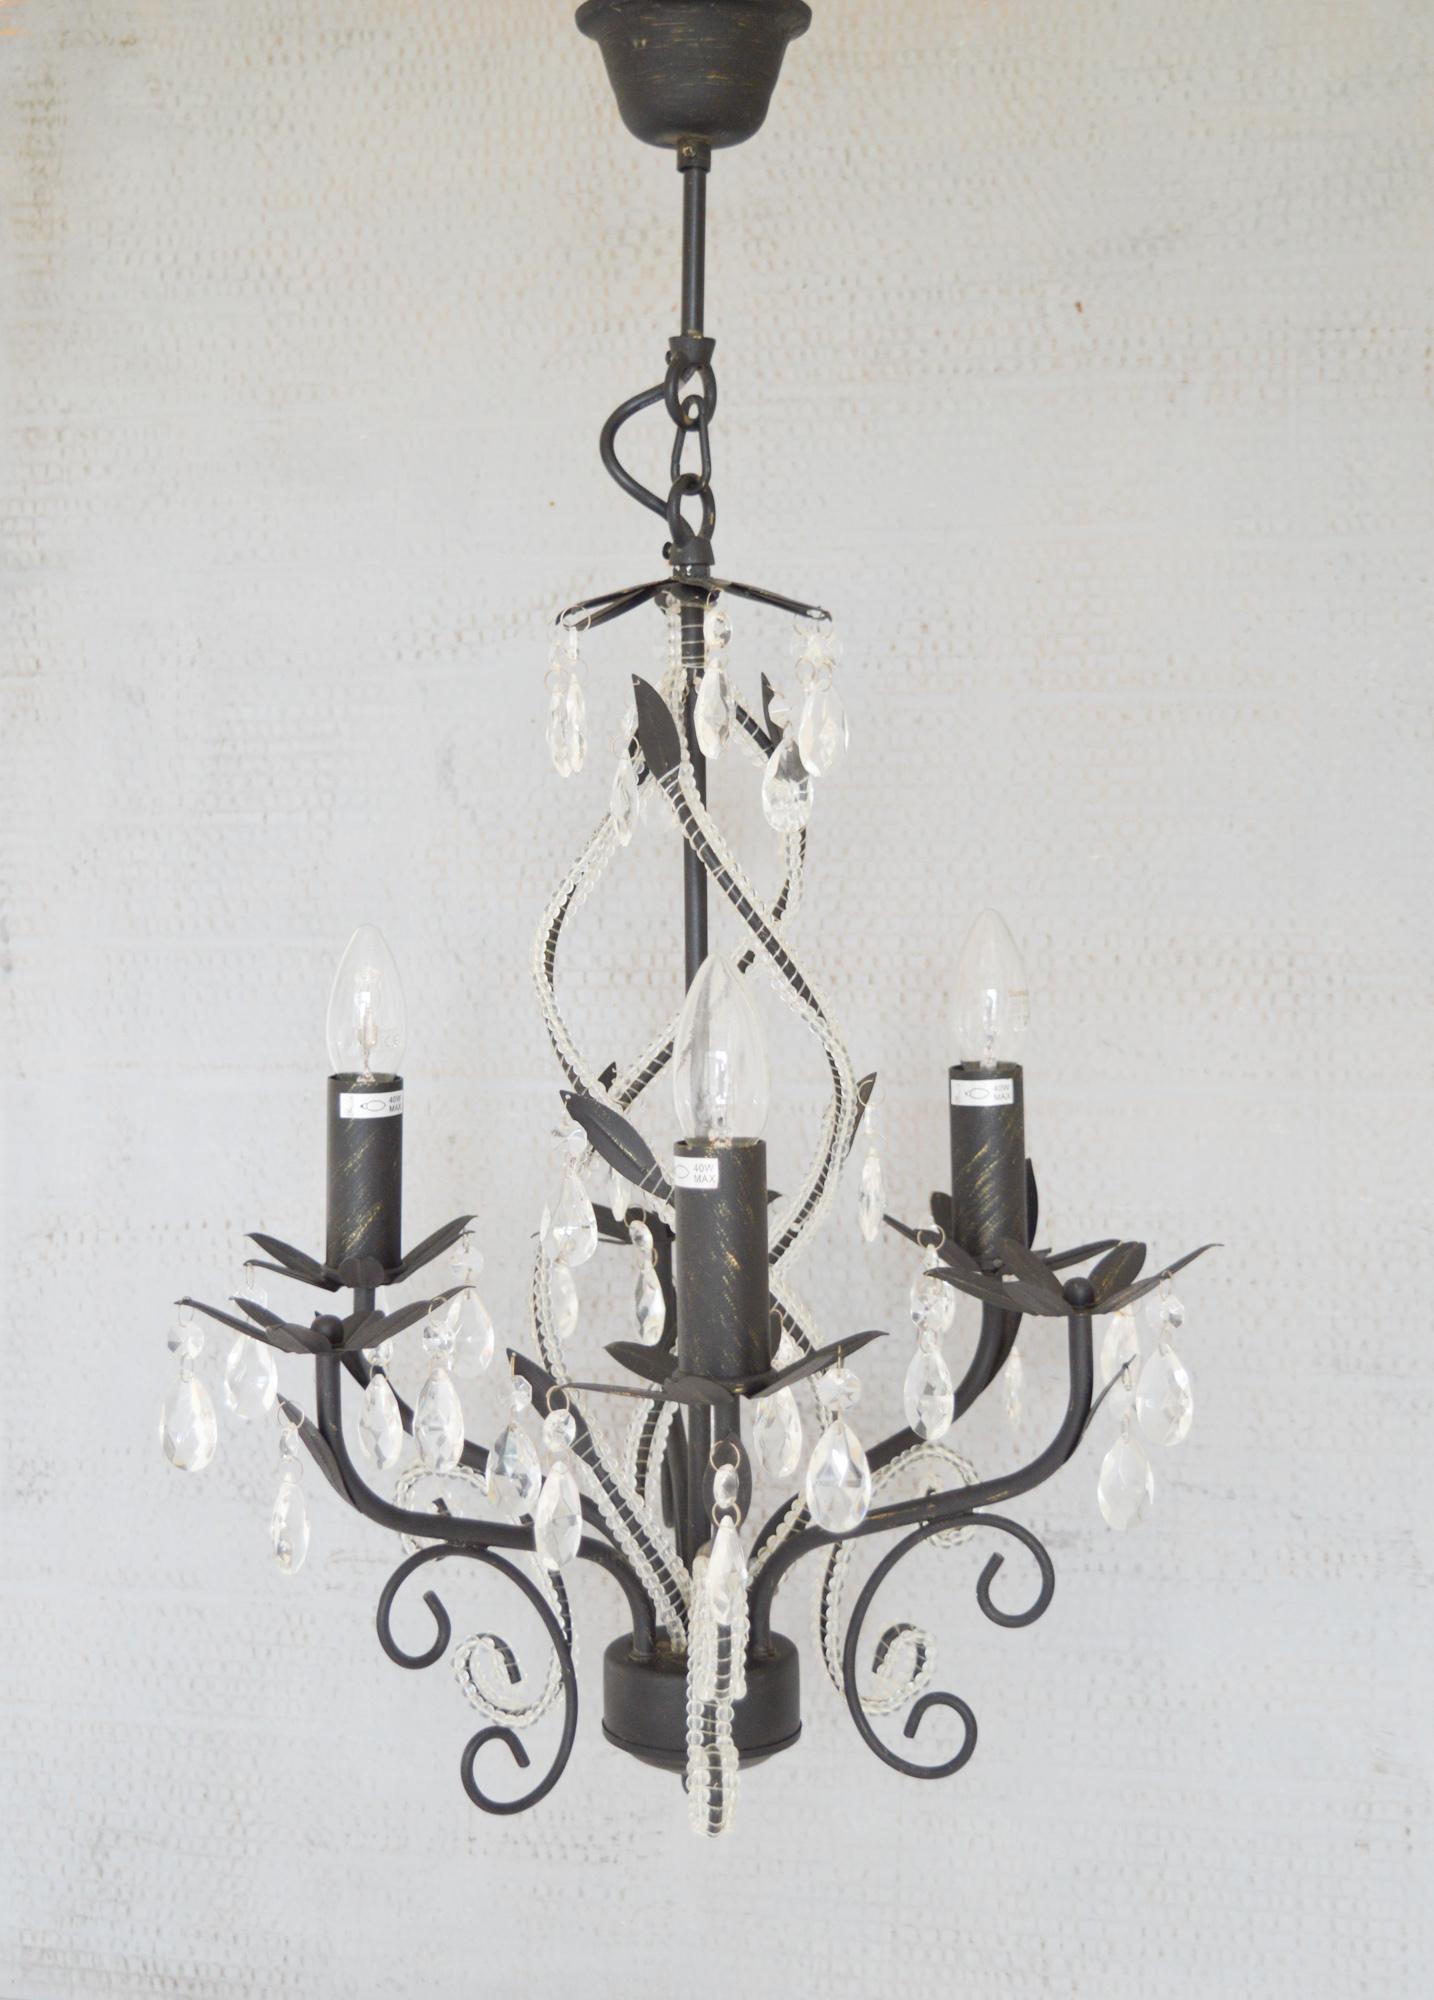 Vintage Black 3 Arm Crystal Glass Chandelier Bhs Wavy Inner Beaded Detail Chandelier Black Metal 3 Light Ornate Chandelier Ceiling Light Bhs Vinterior